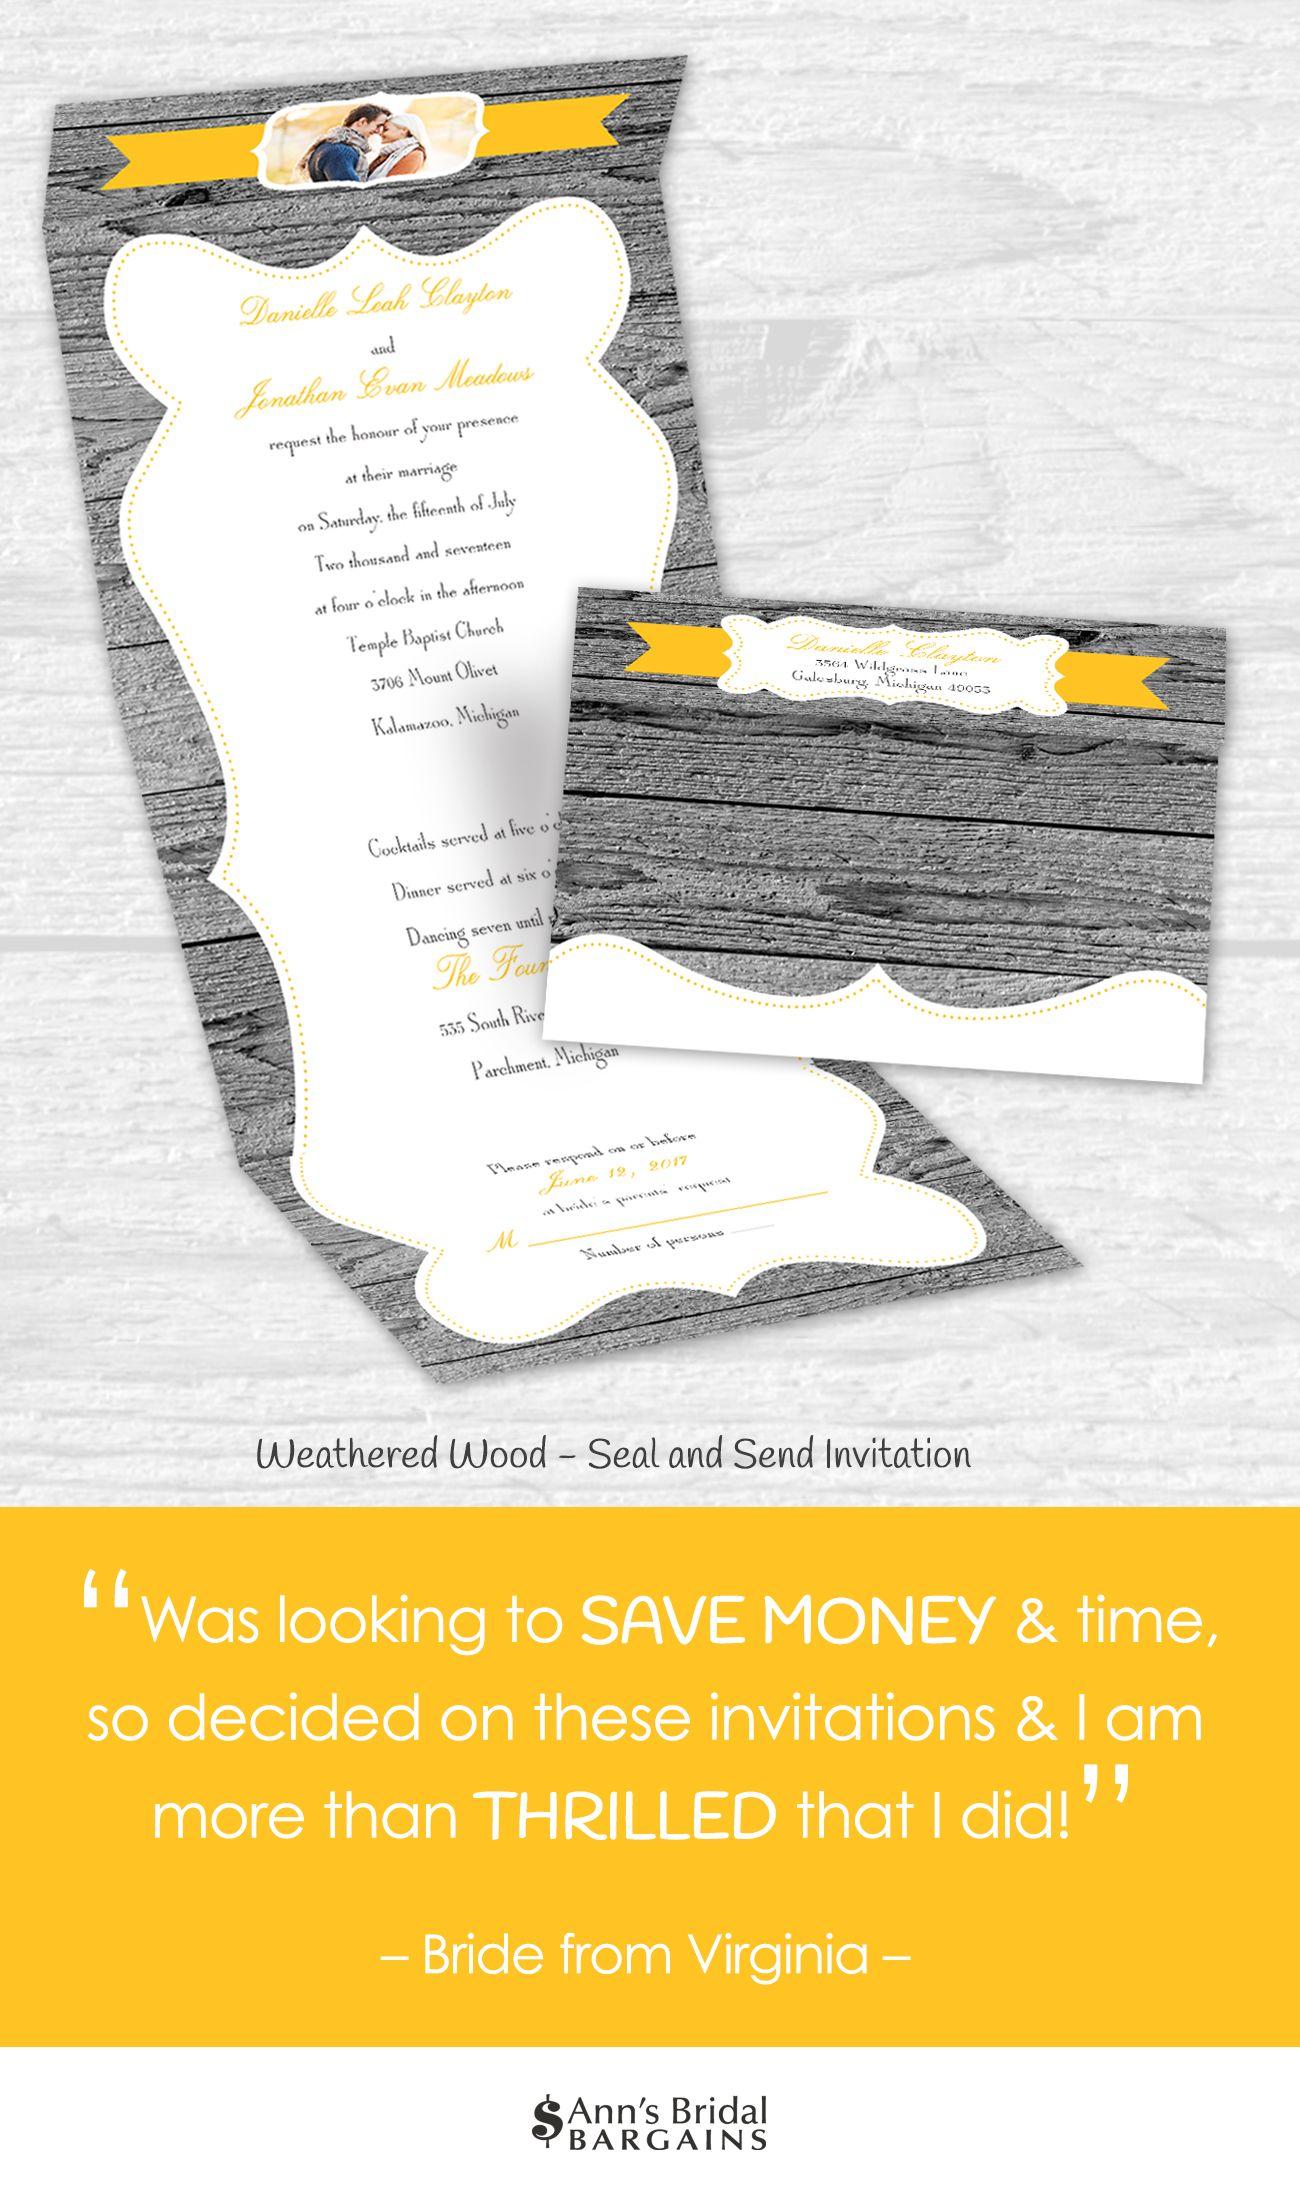 Brides love this rustic seal and send wedding invitation.  #rustic #wood #photo #cheapwedding